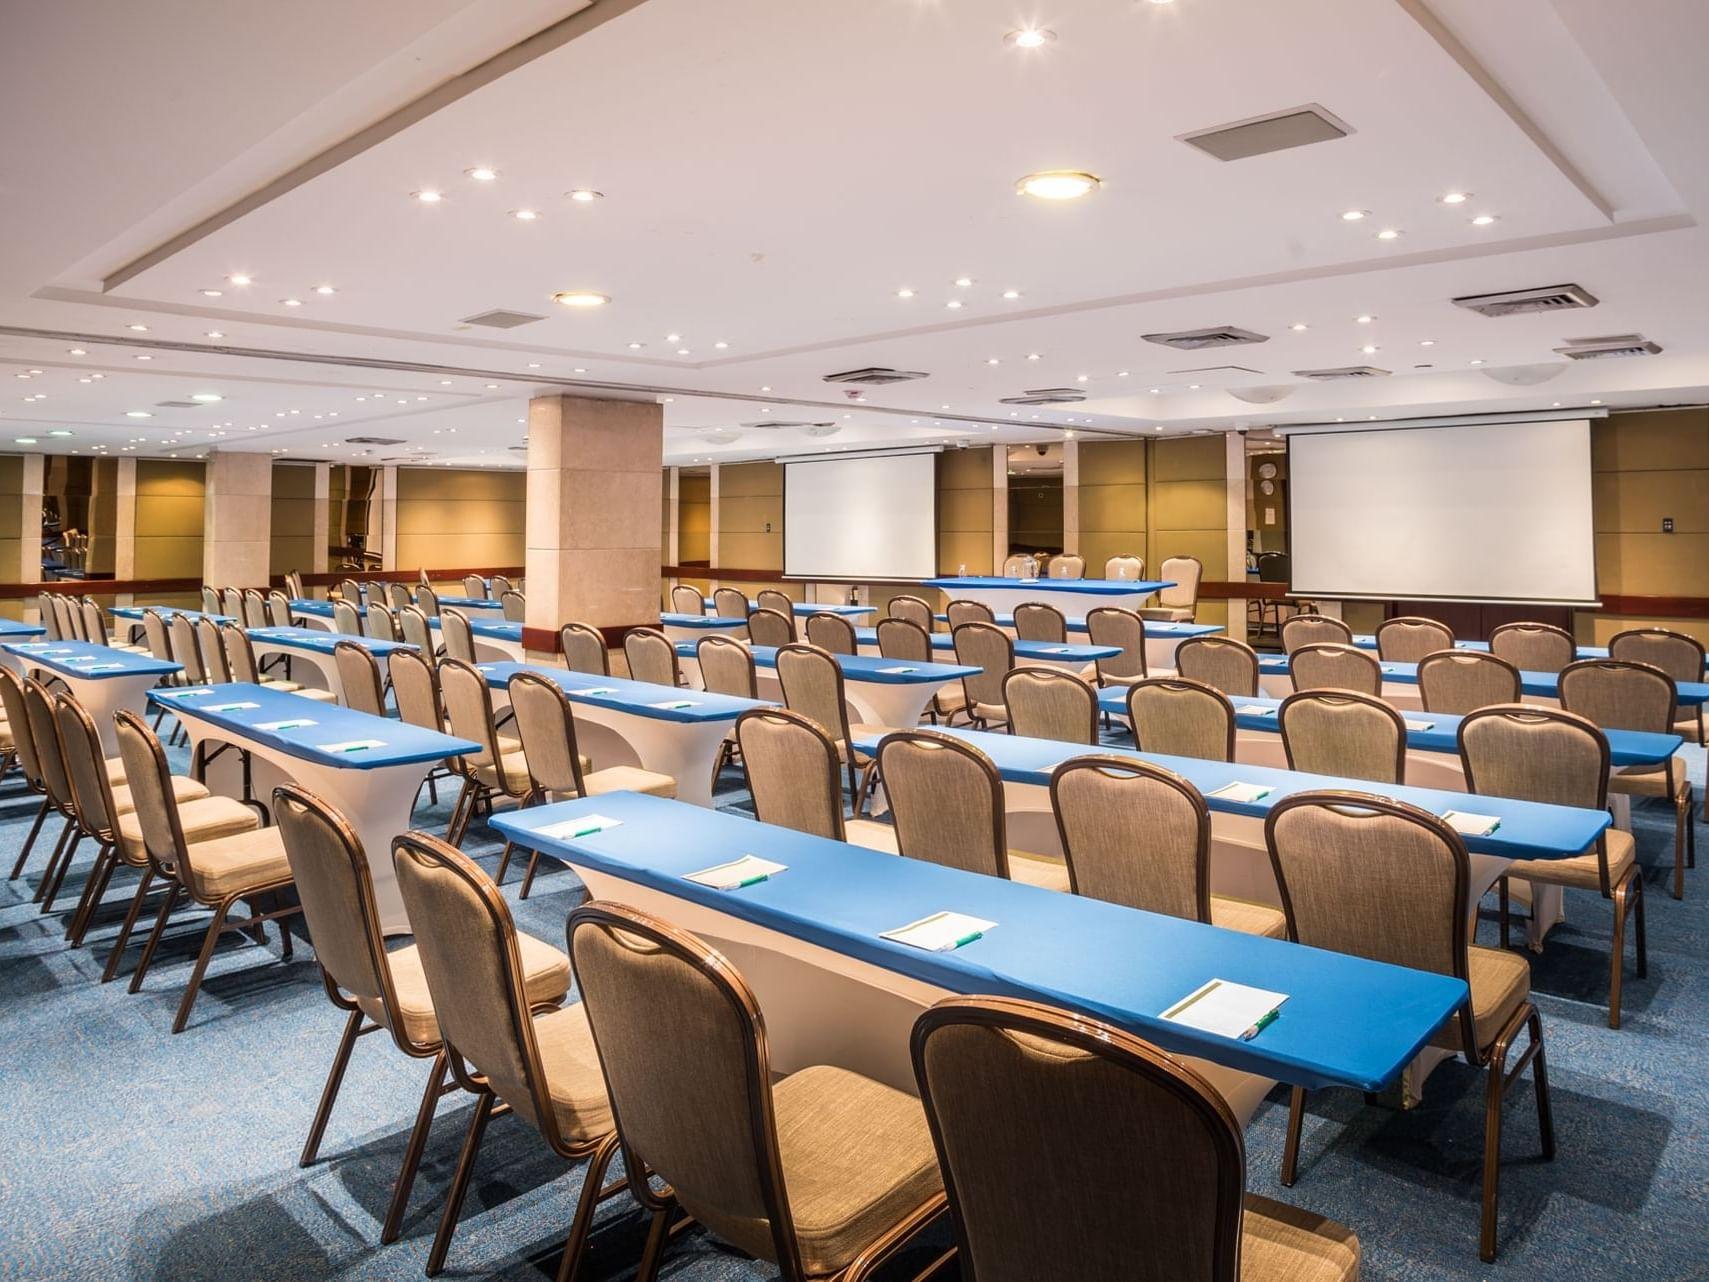 La Carolina room arranged for an event at Bogota Plaza Hotel